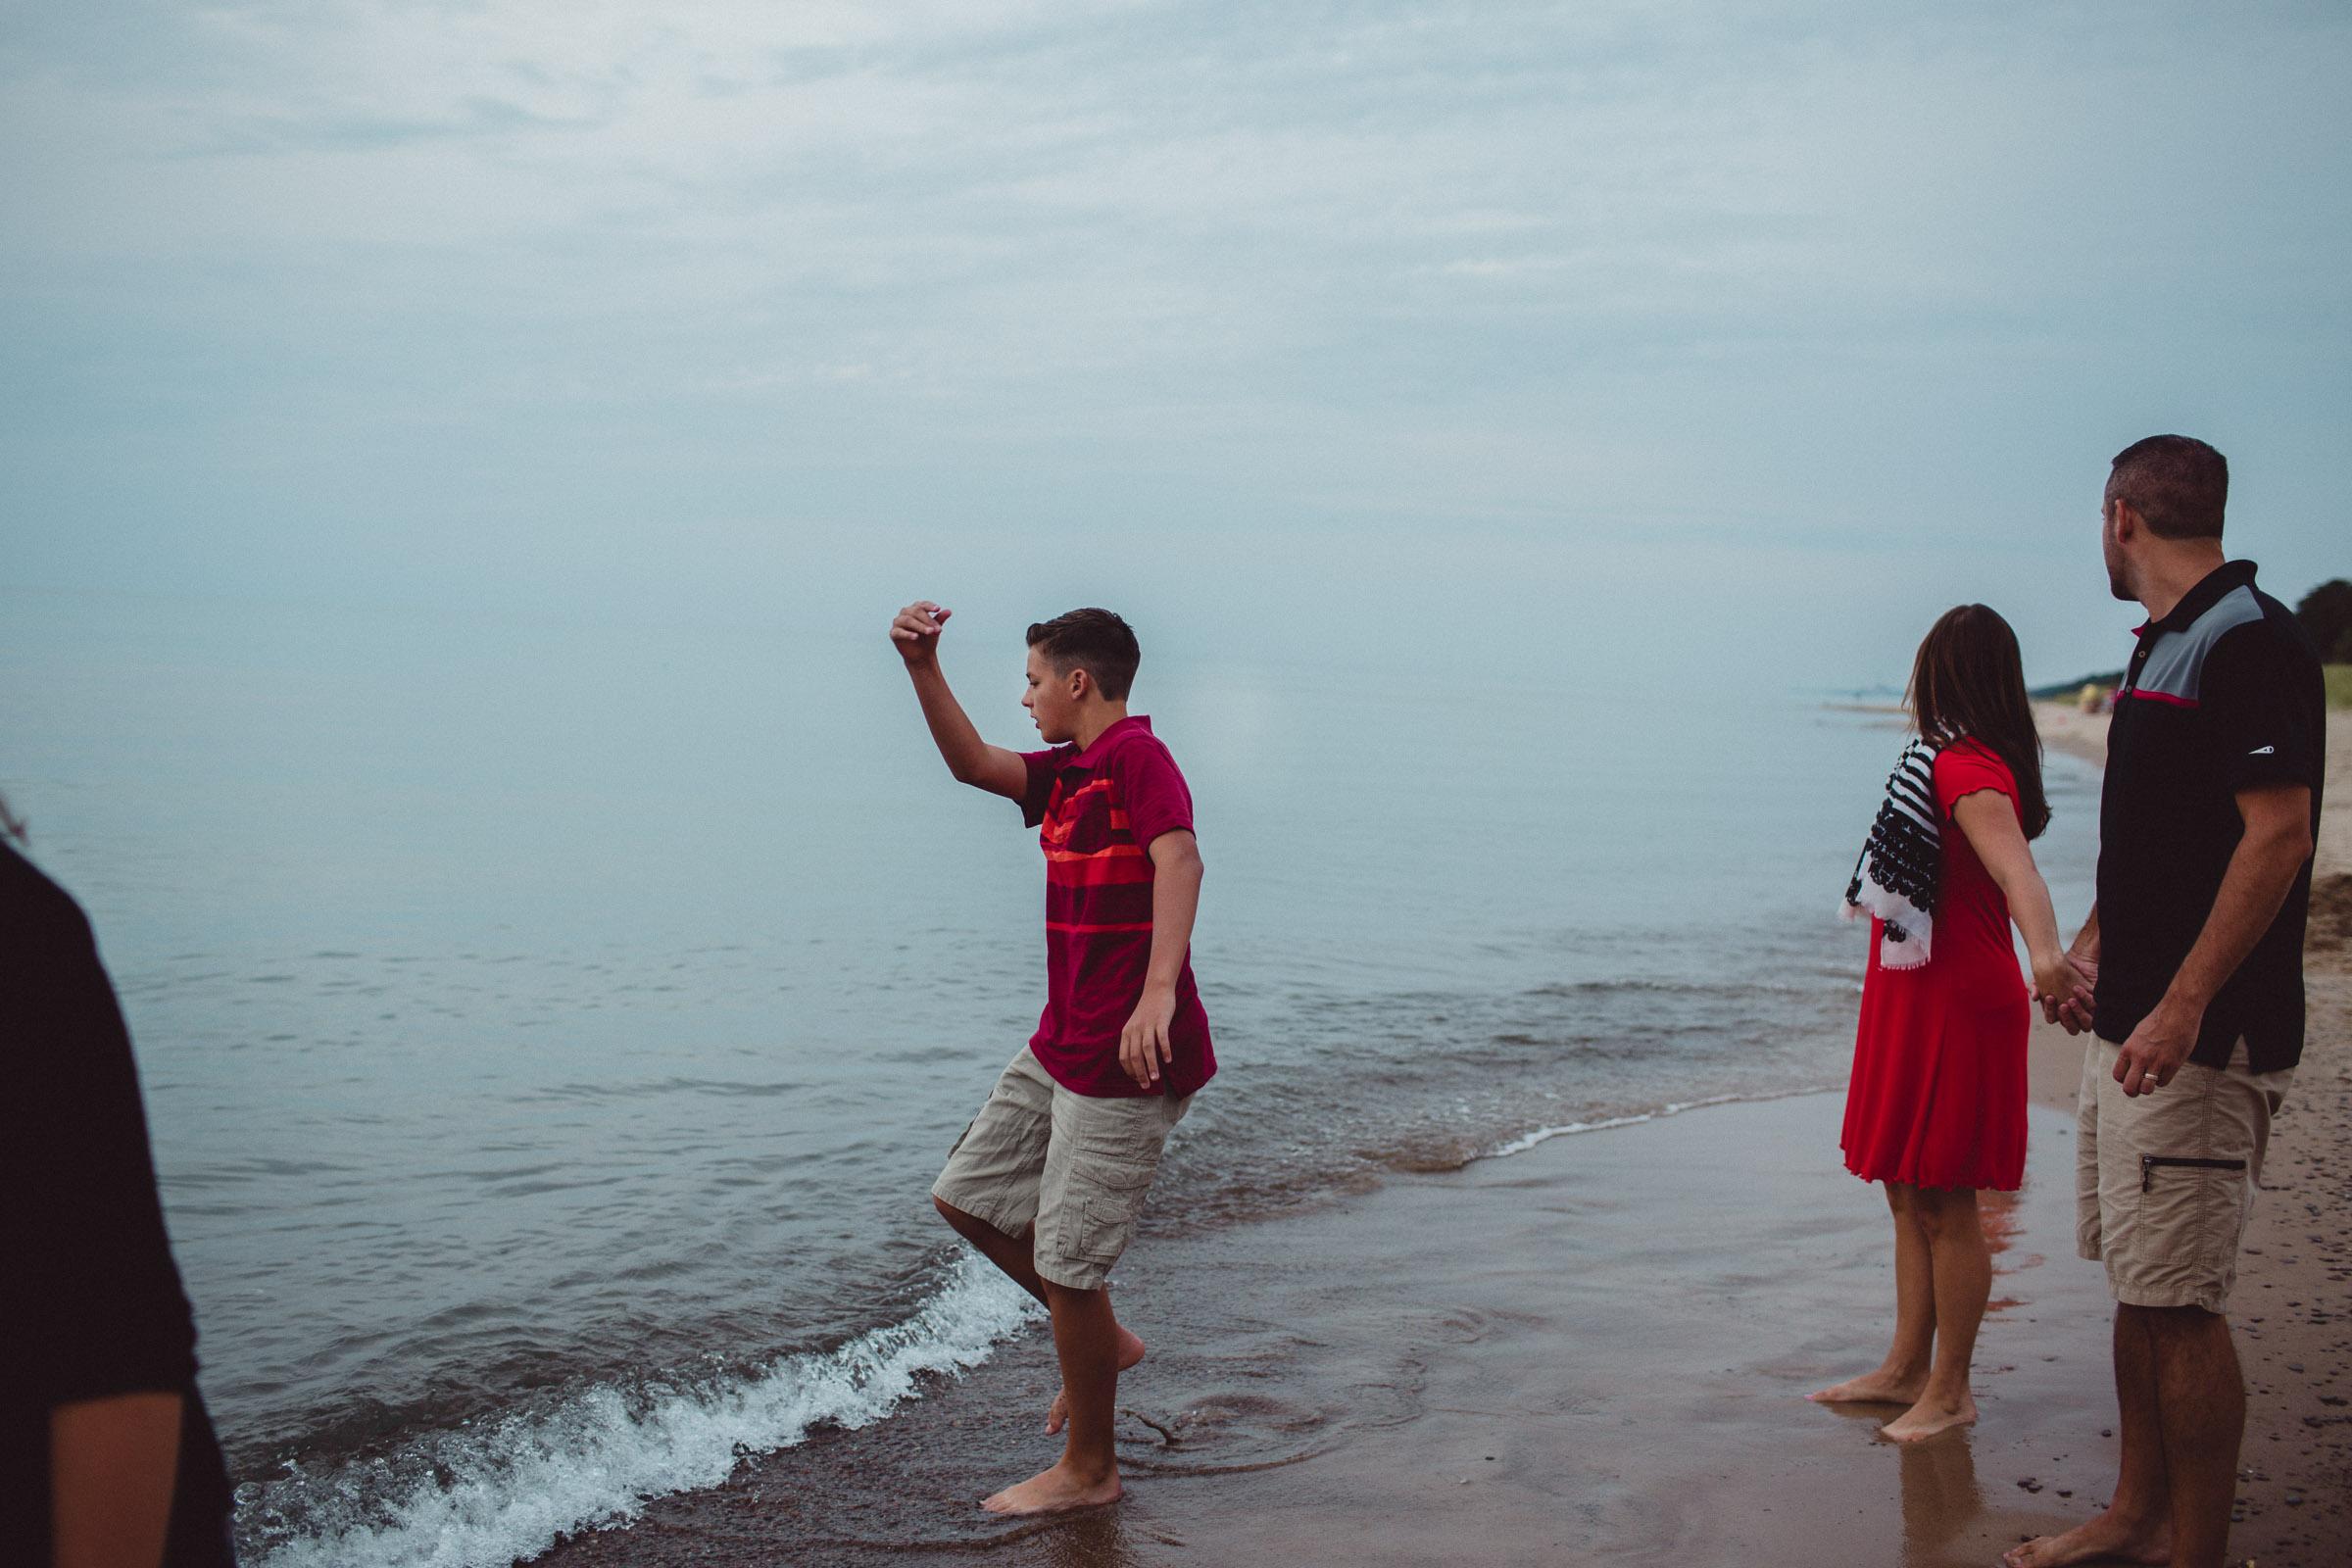 teenager throwing rocks into the lake